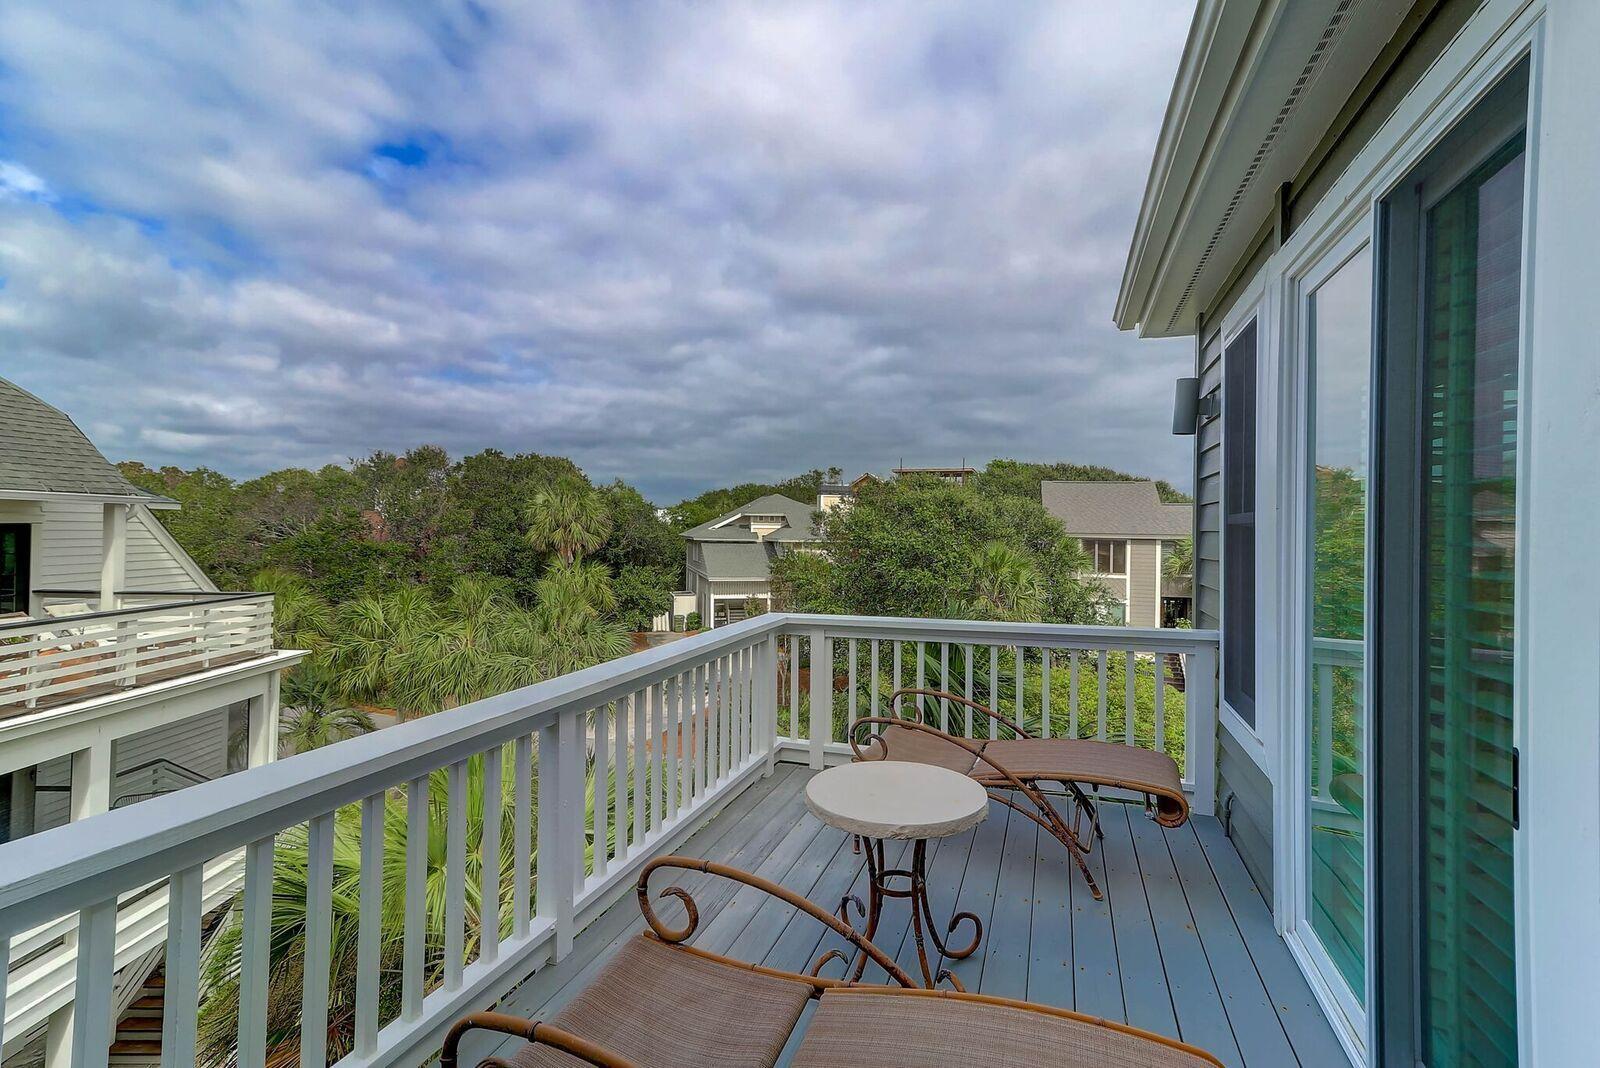 Wild Dunes Resort Homes For Sale - 3 Beachwood East, Isle of Palms, SC - 9